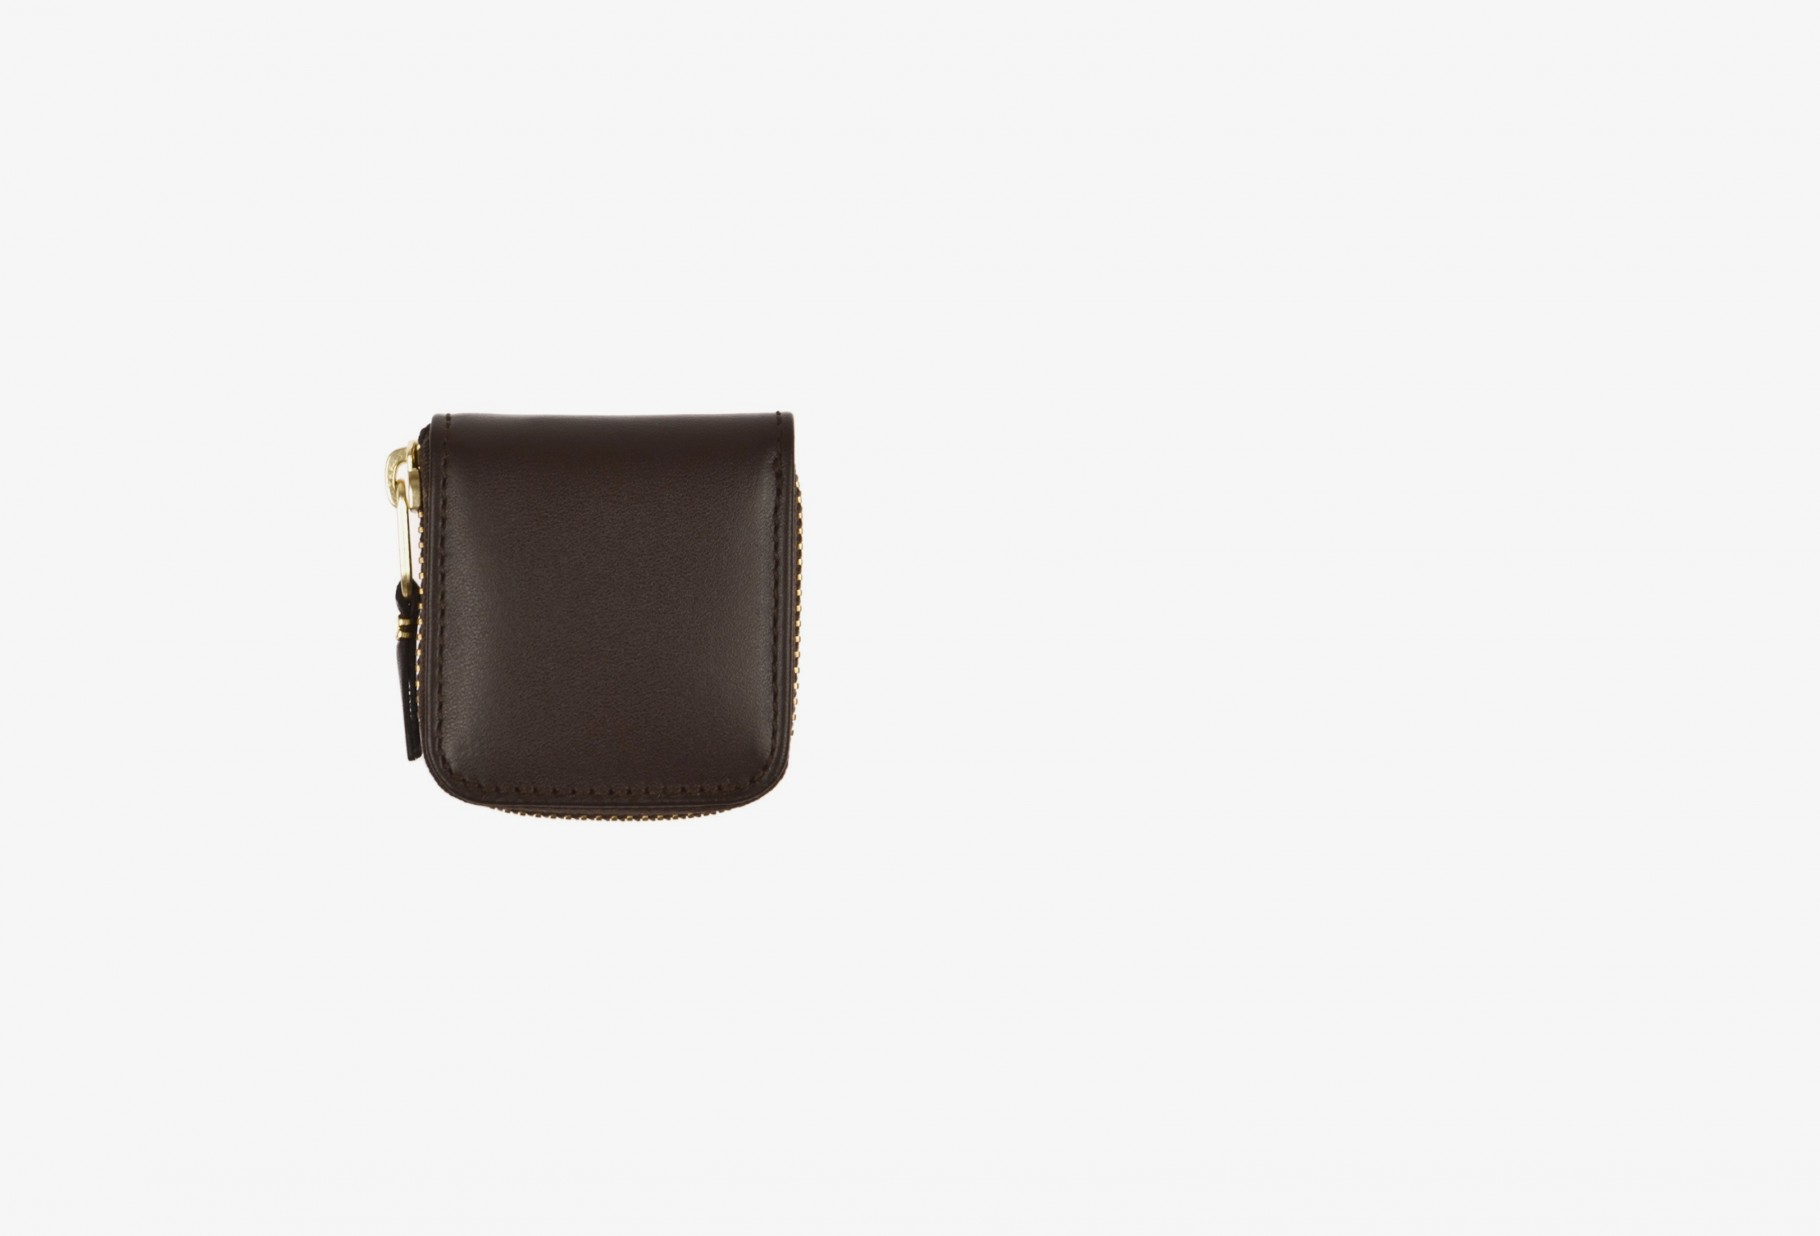 COMME DES GARÇONS WALLETS / Cdg leather wallet classic Sa4100 brown